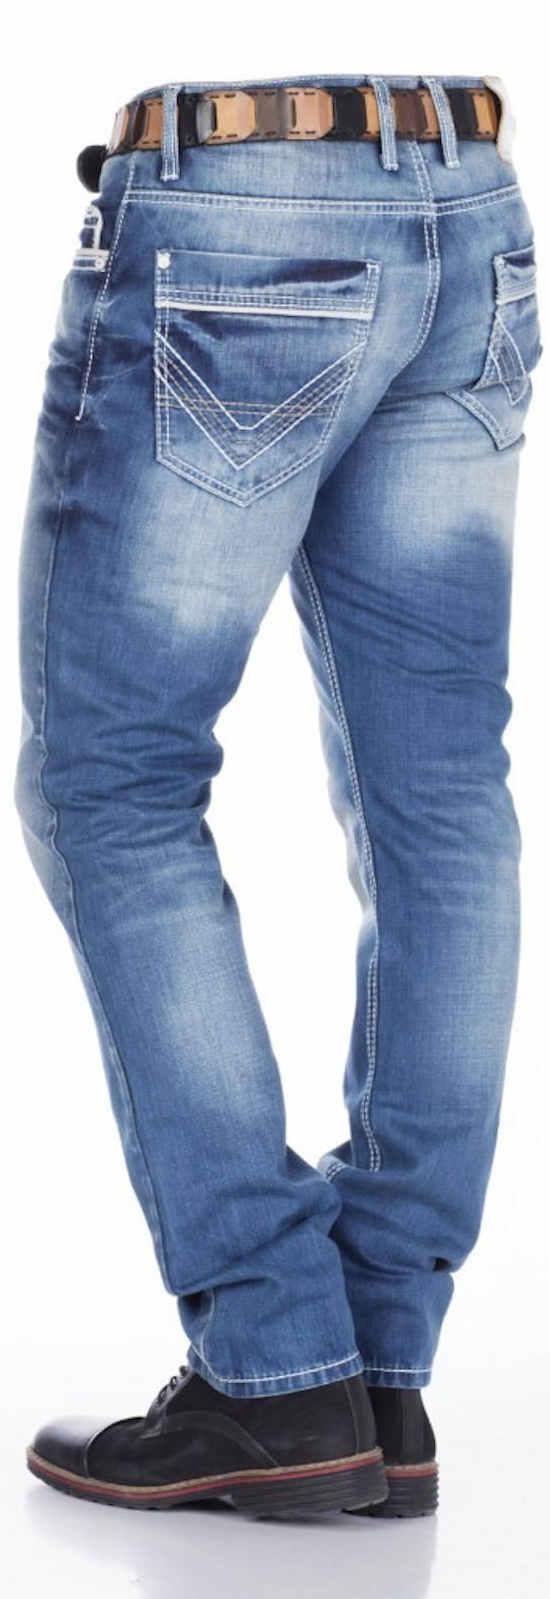 CIPO /& BAXX Herren Jeans CD184 NEU Hose Straight Cut Regular Gerades Bein Denim